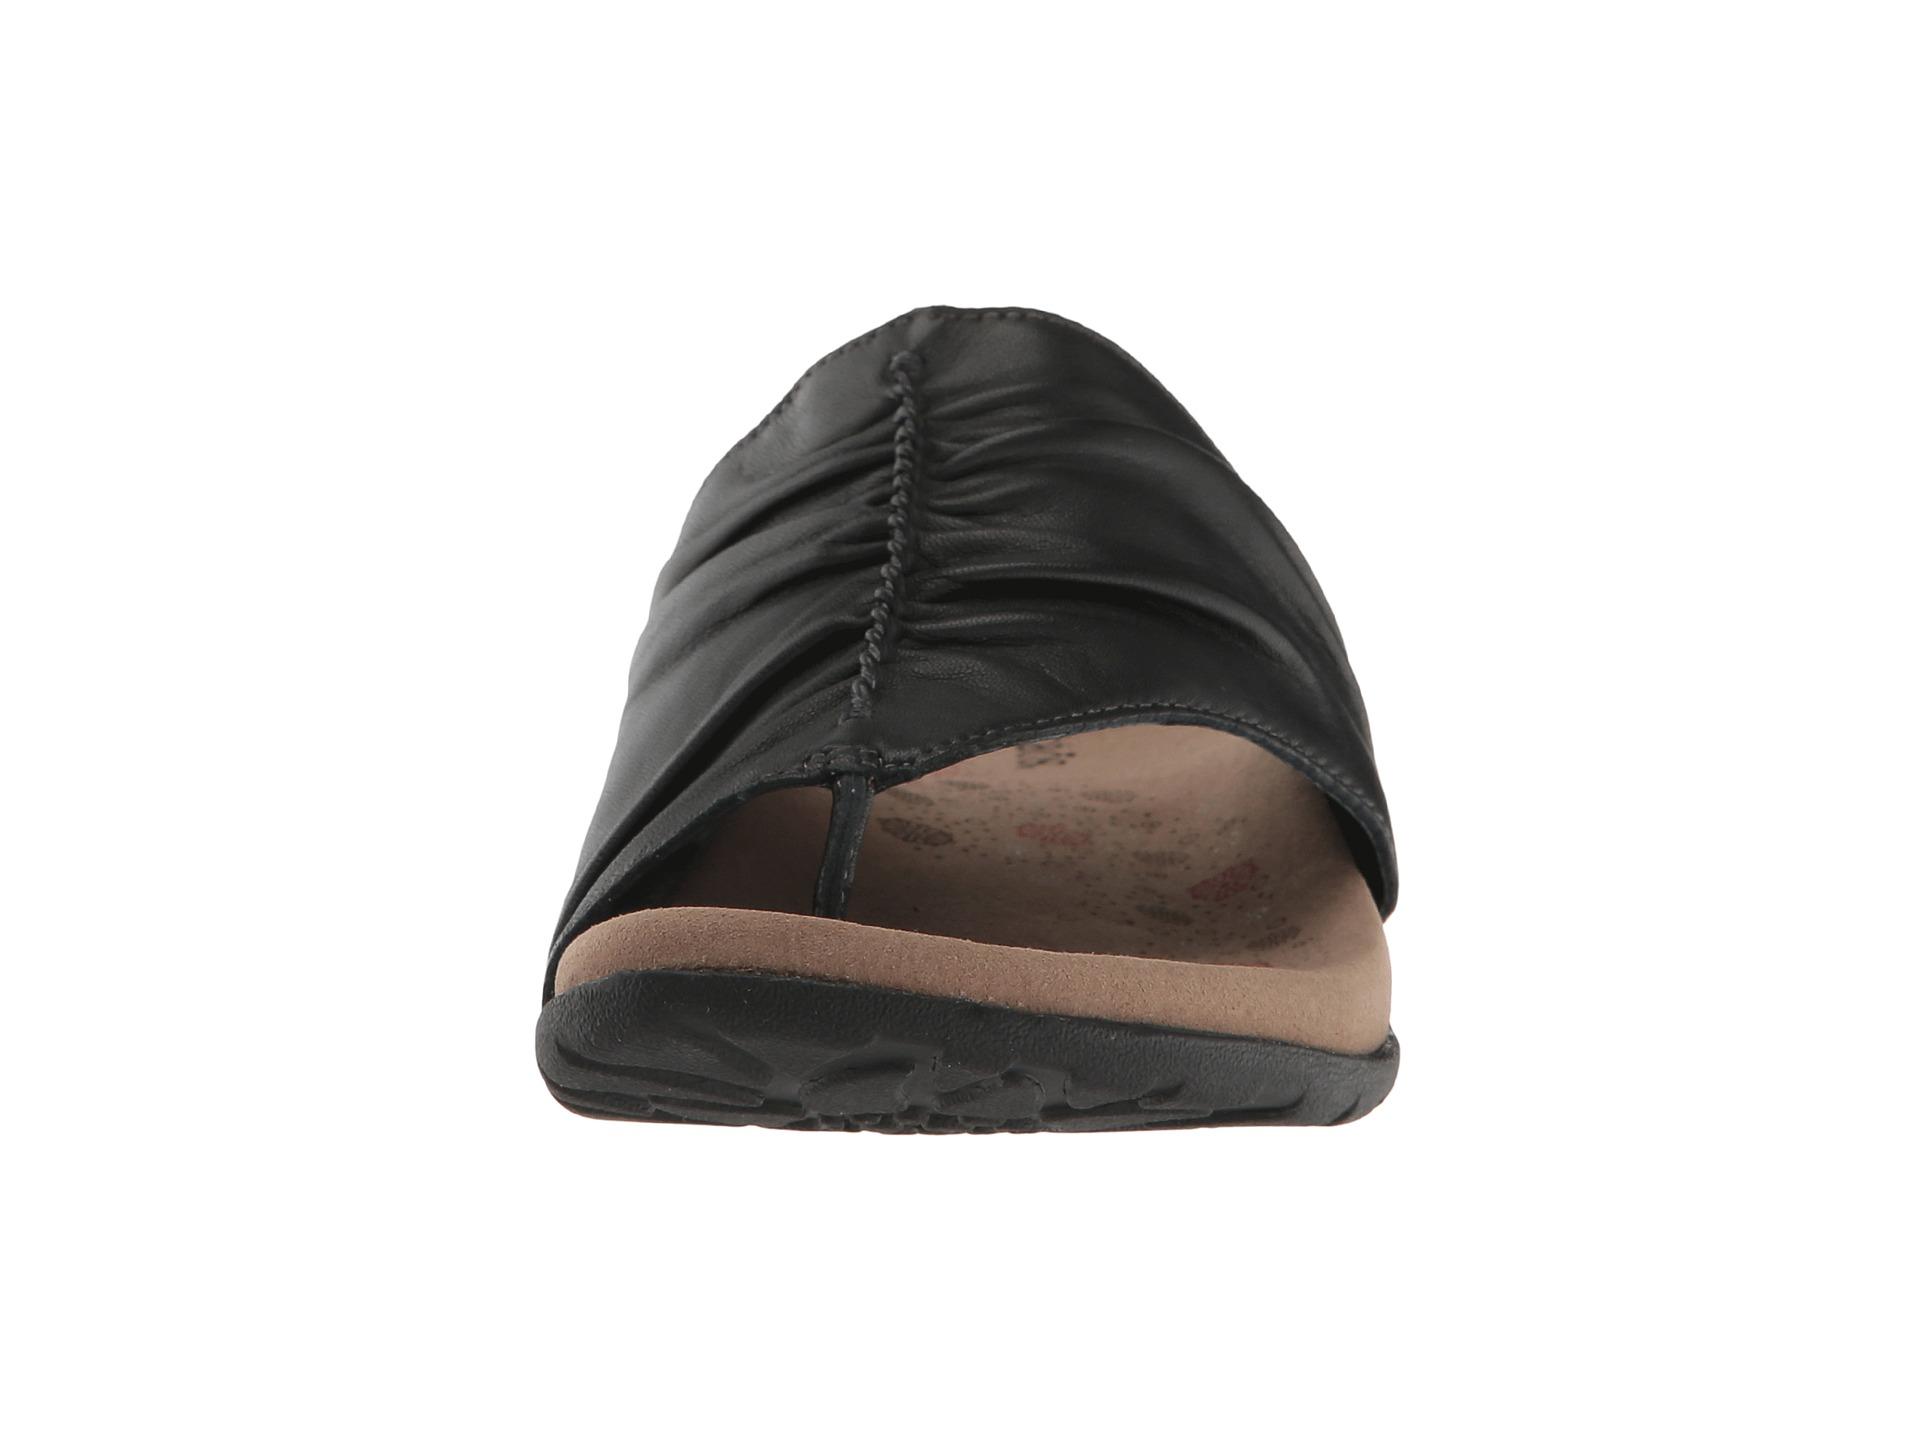 Taos Footwear Gift 2 At Zappos Com